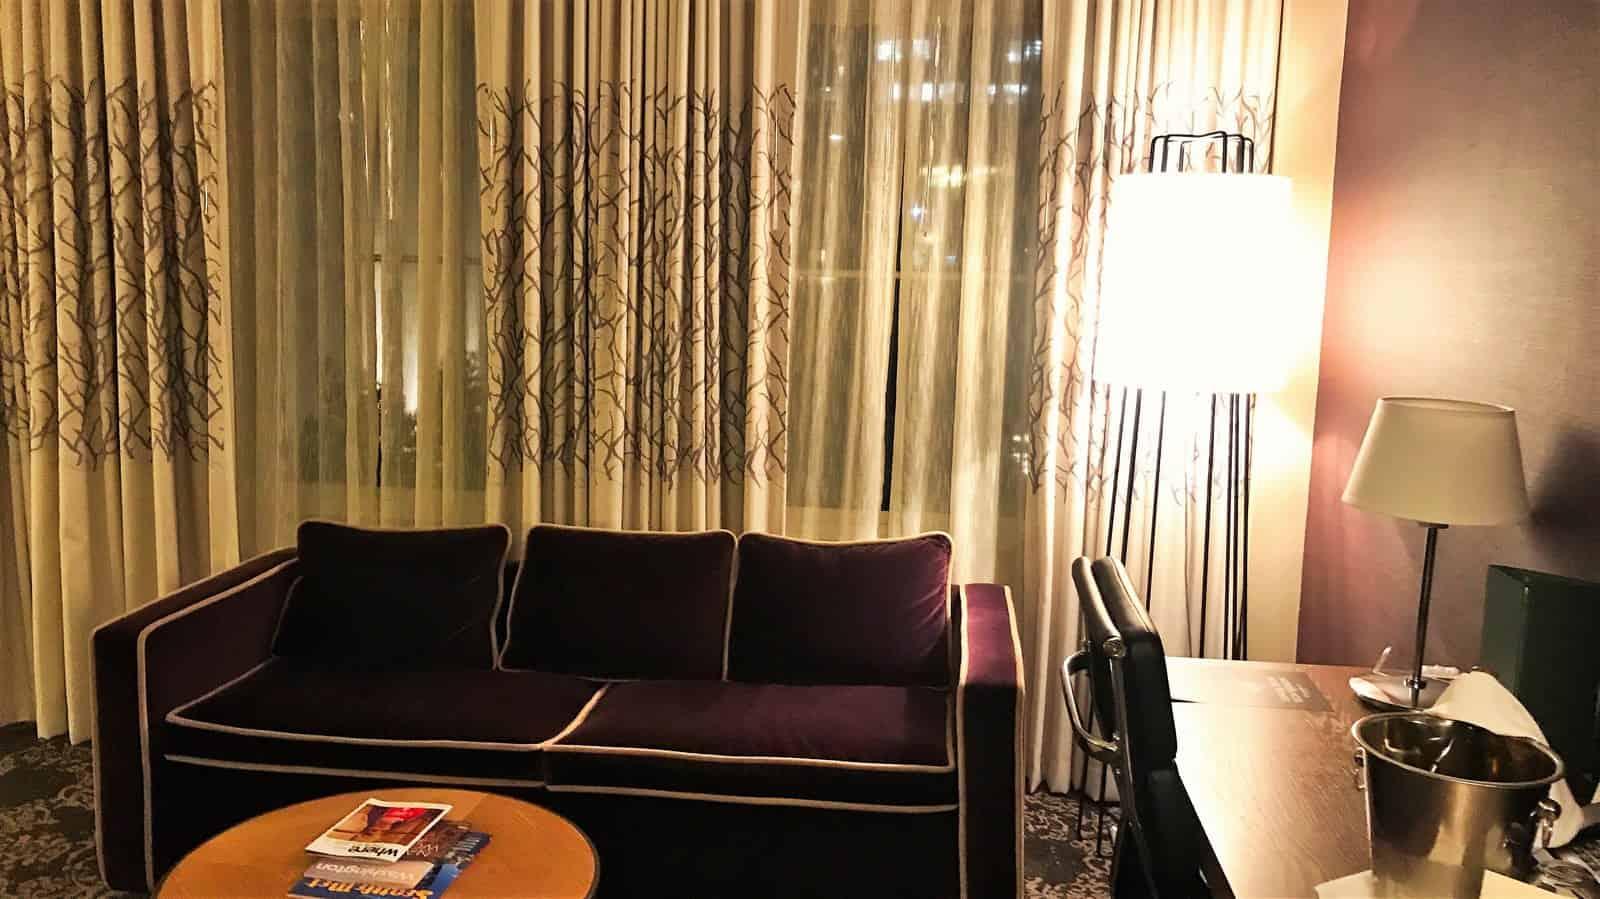 Seattle Hotel Vintage